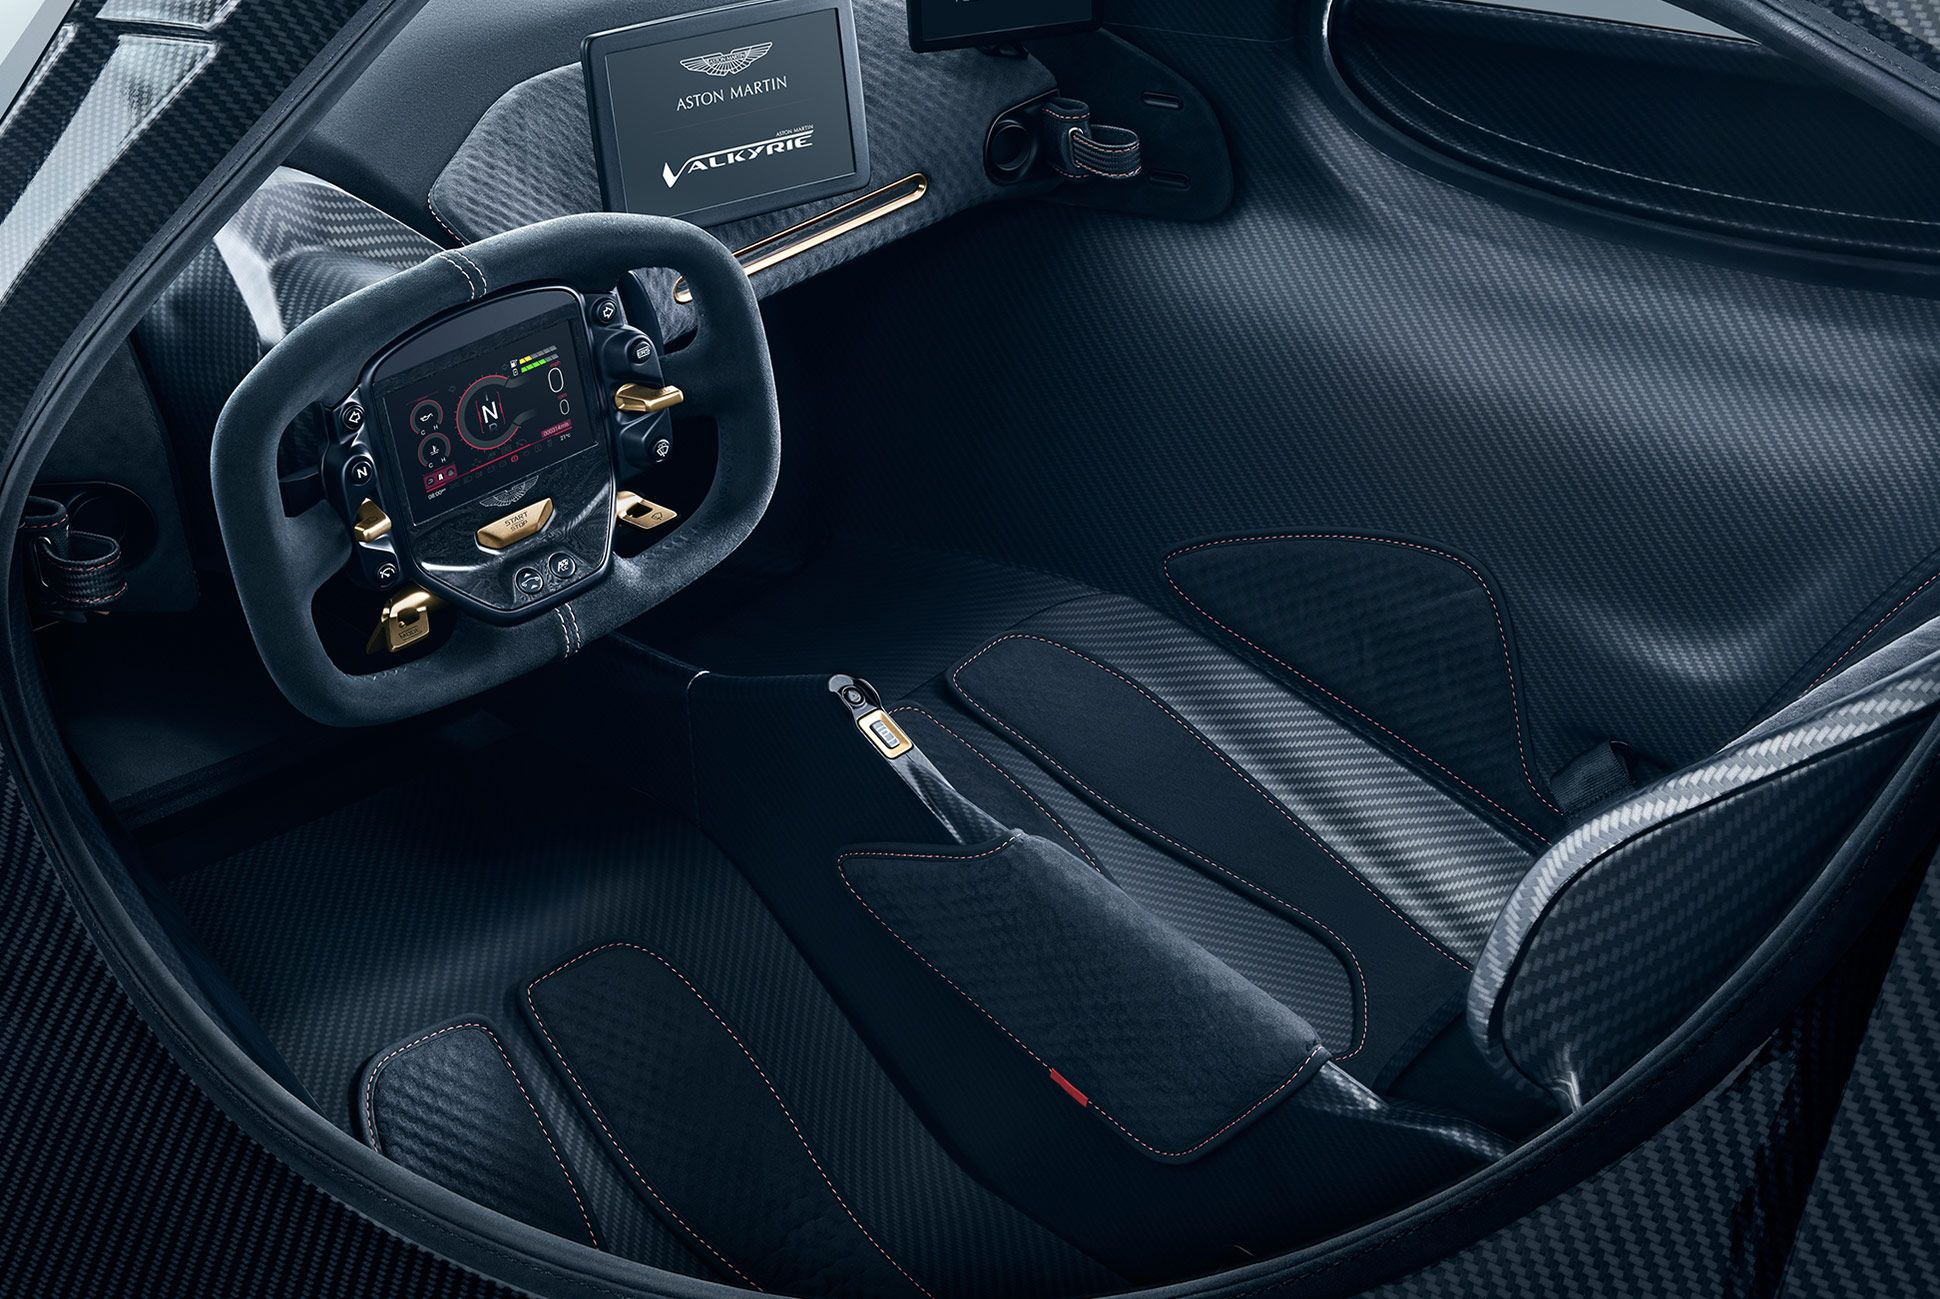 Aston-Martin-Valkyrie-Gear-Patrol-6